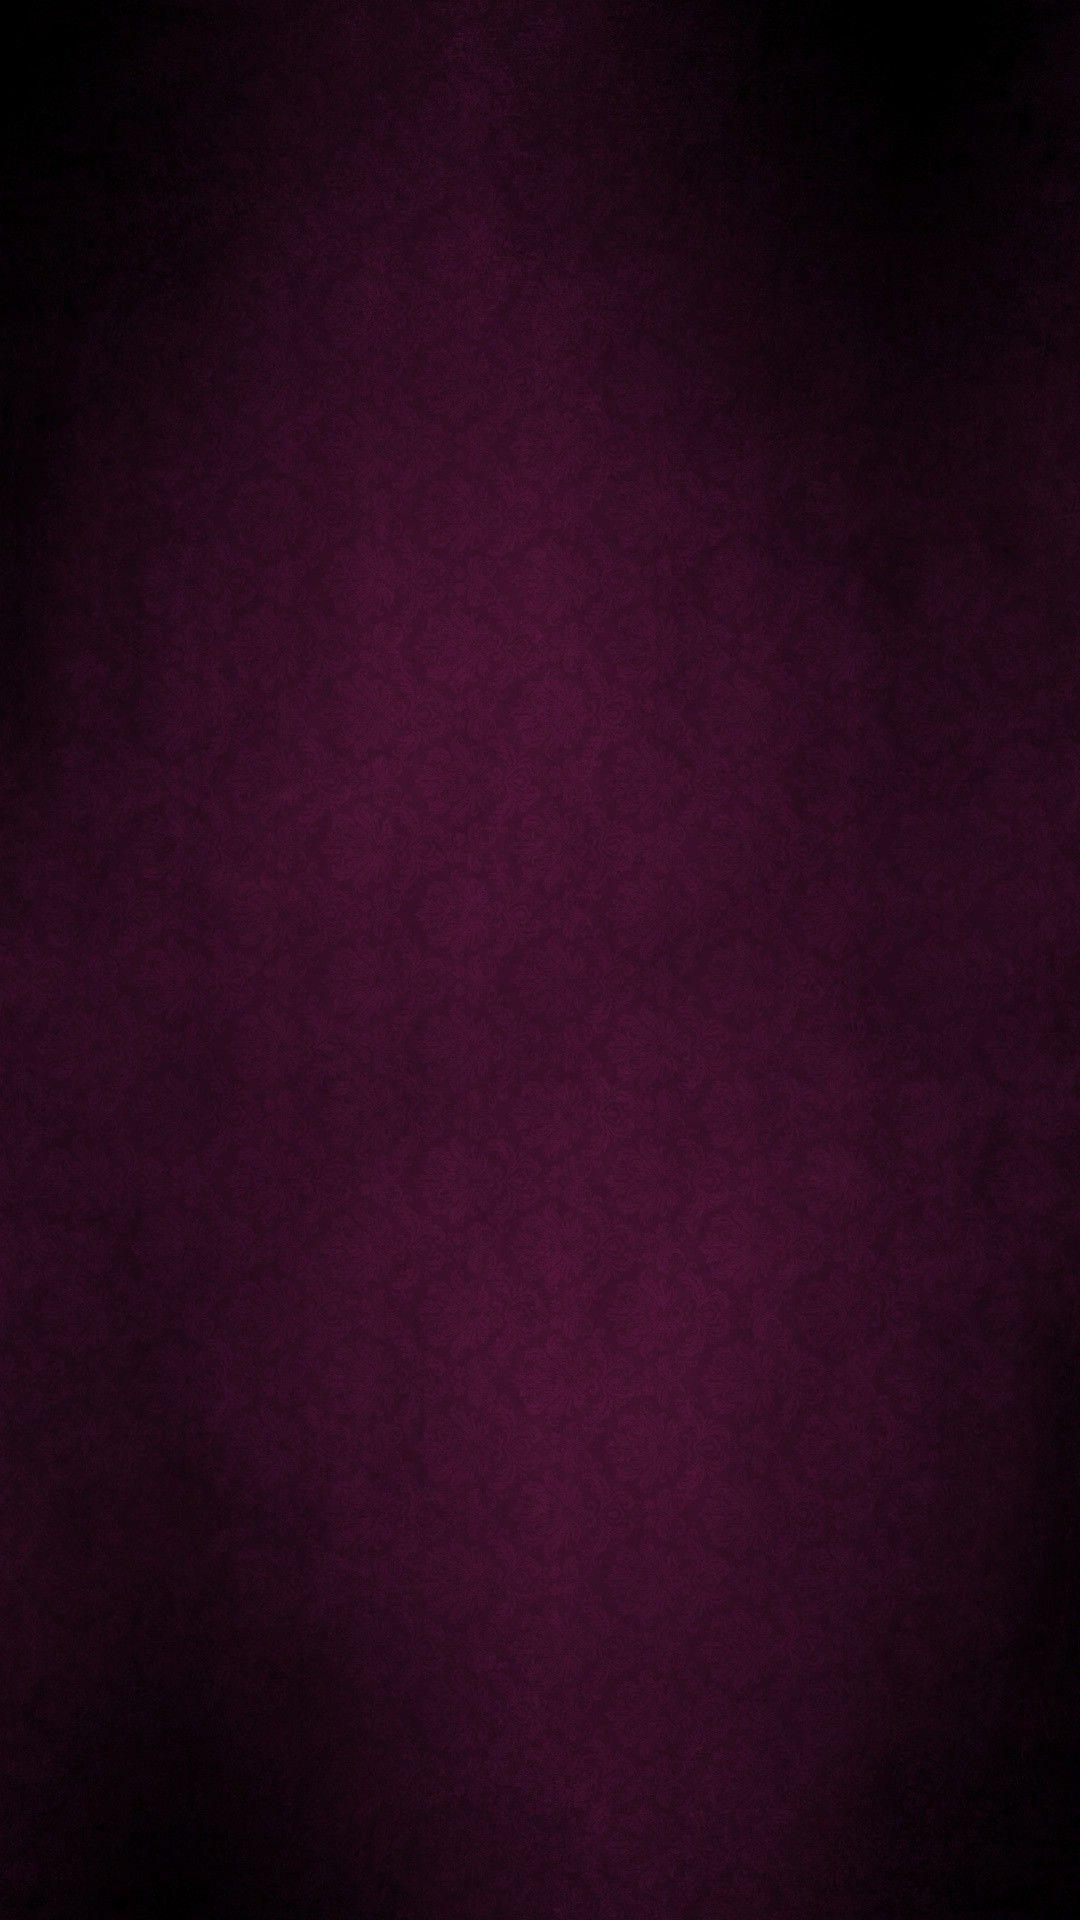 Pin by chelsea on Backgrounds Dark purple wallpaper